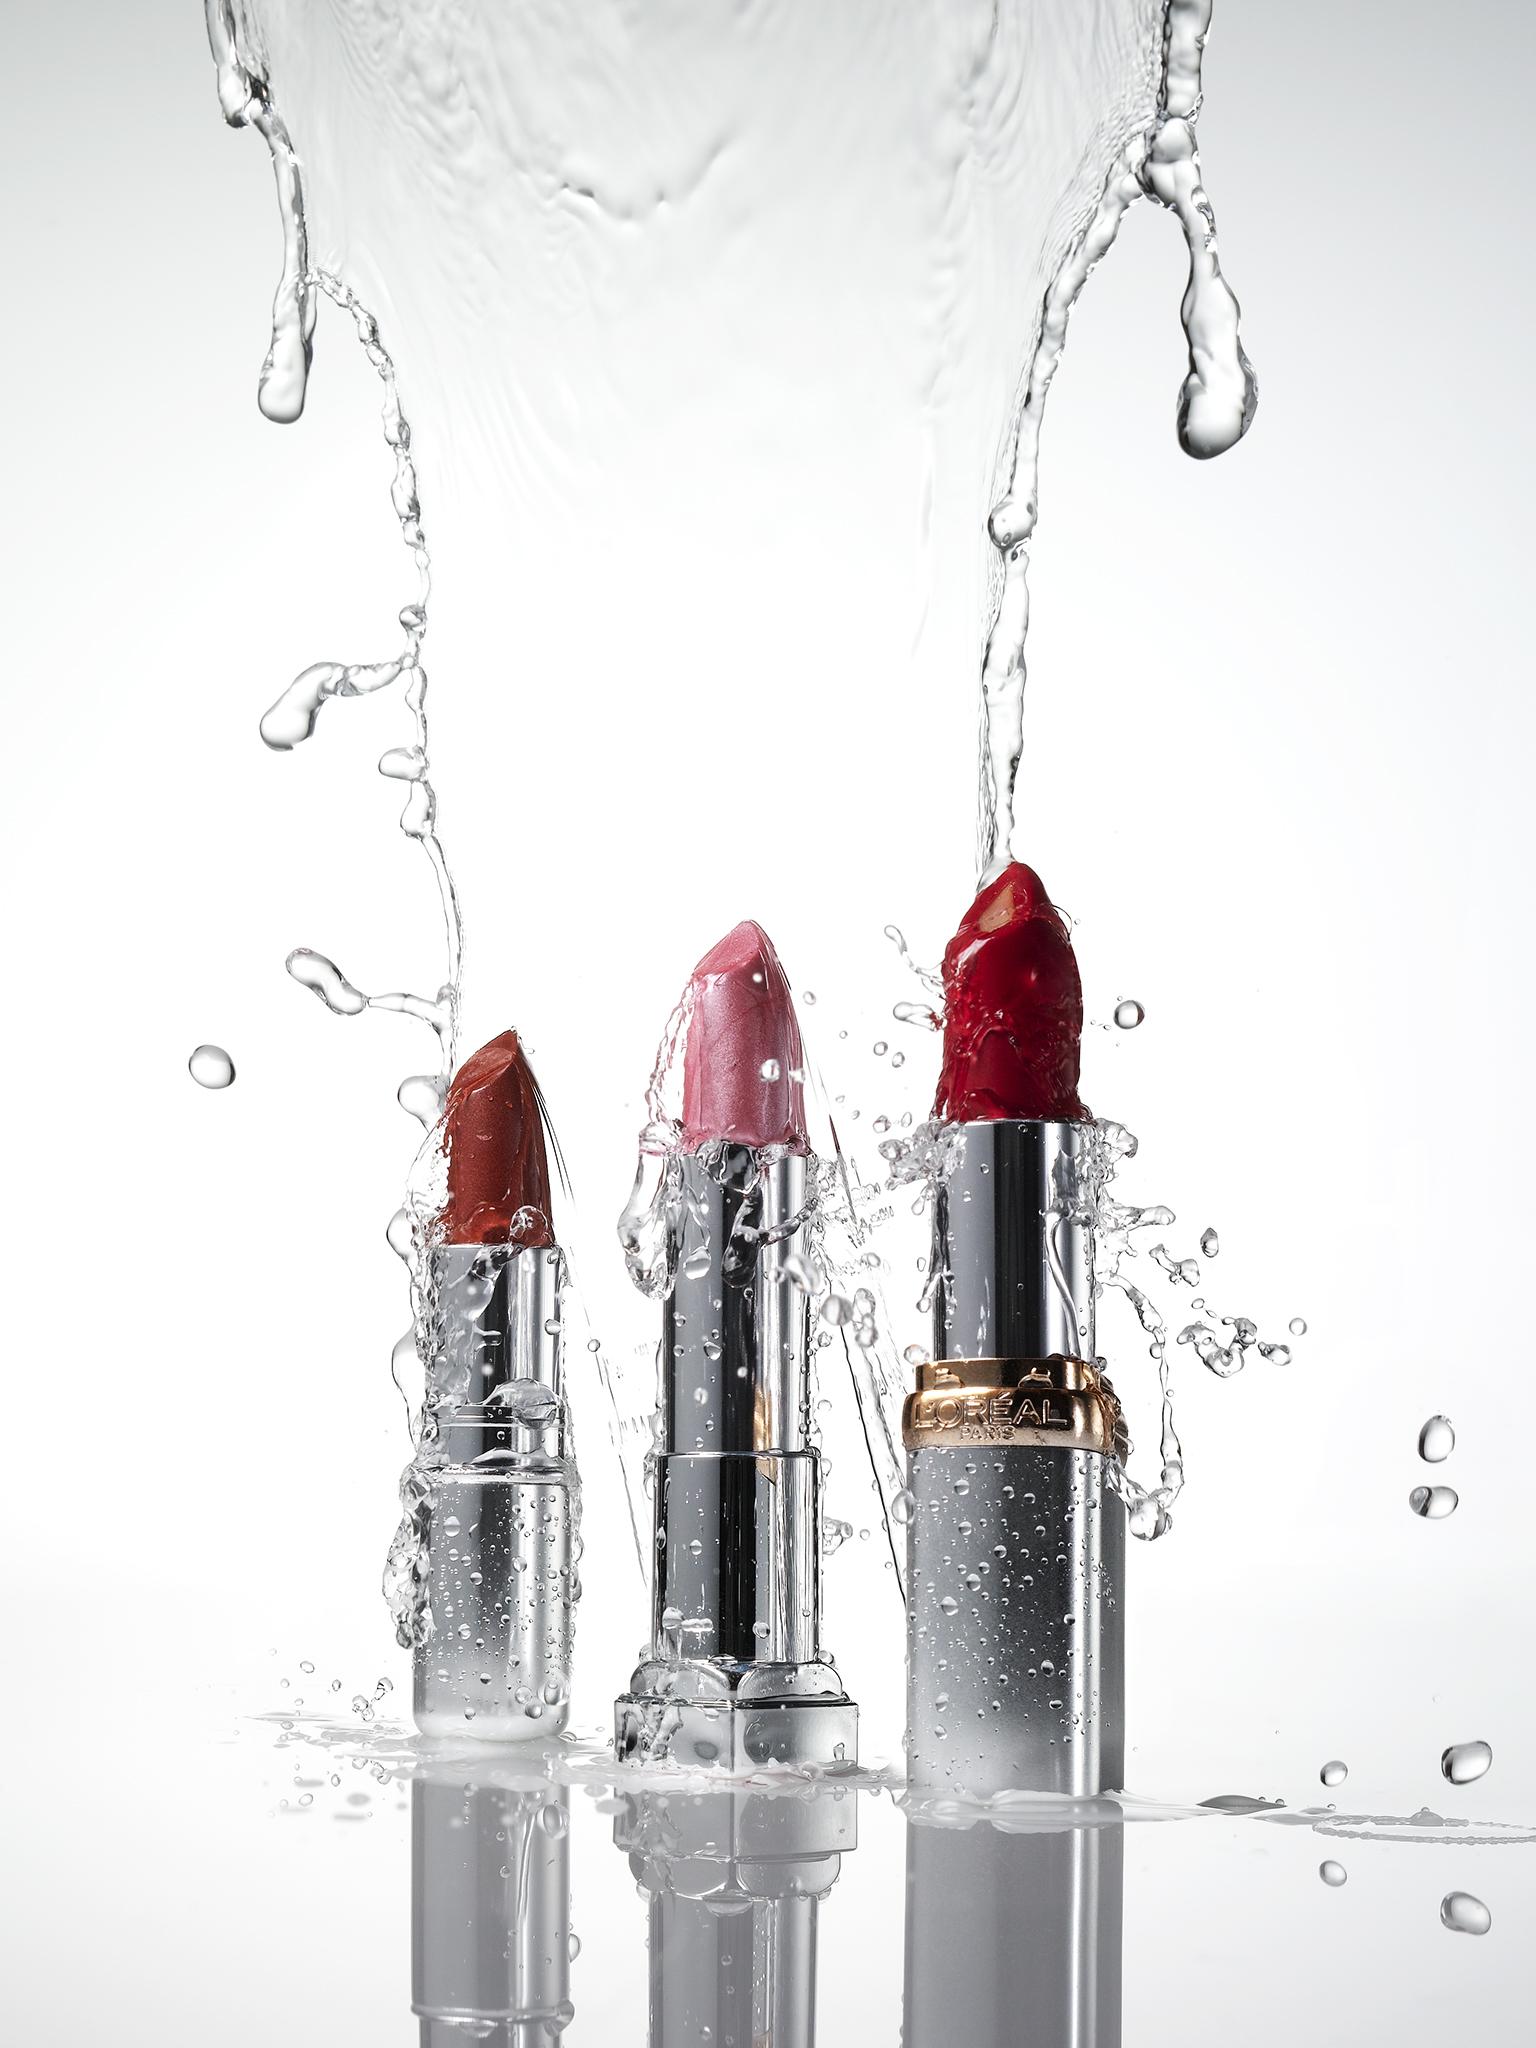 LipstickSplash-web.jpg